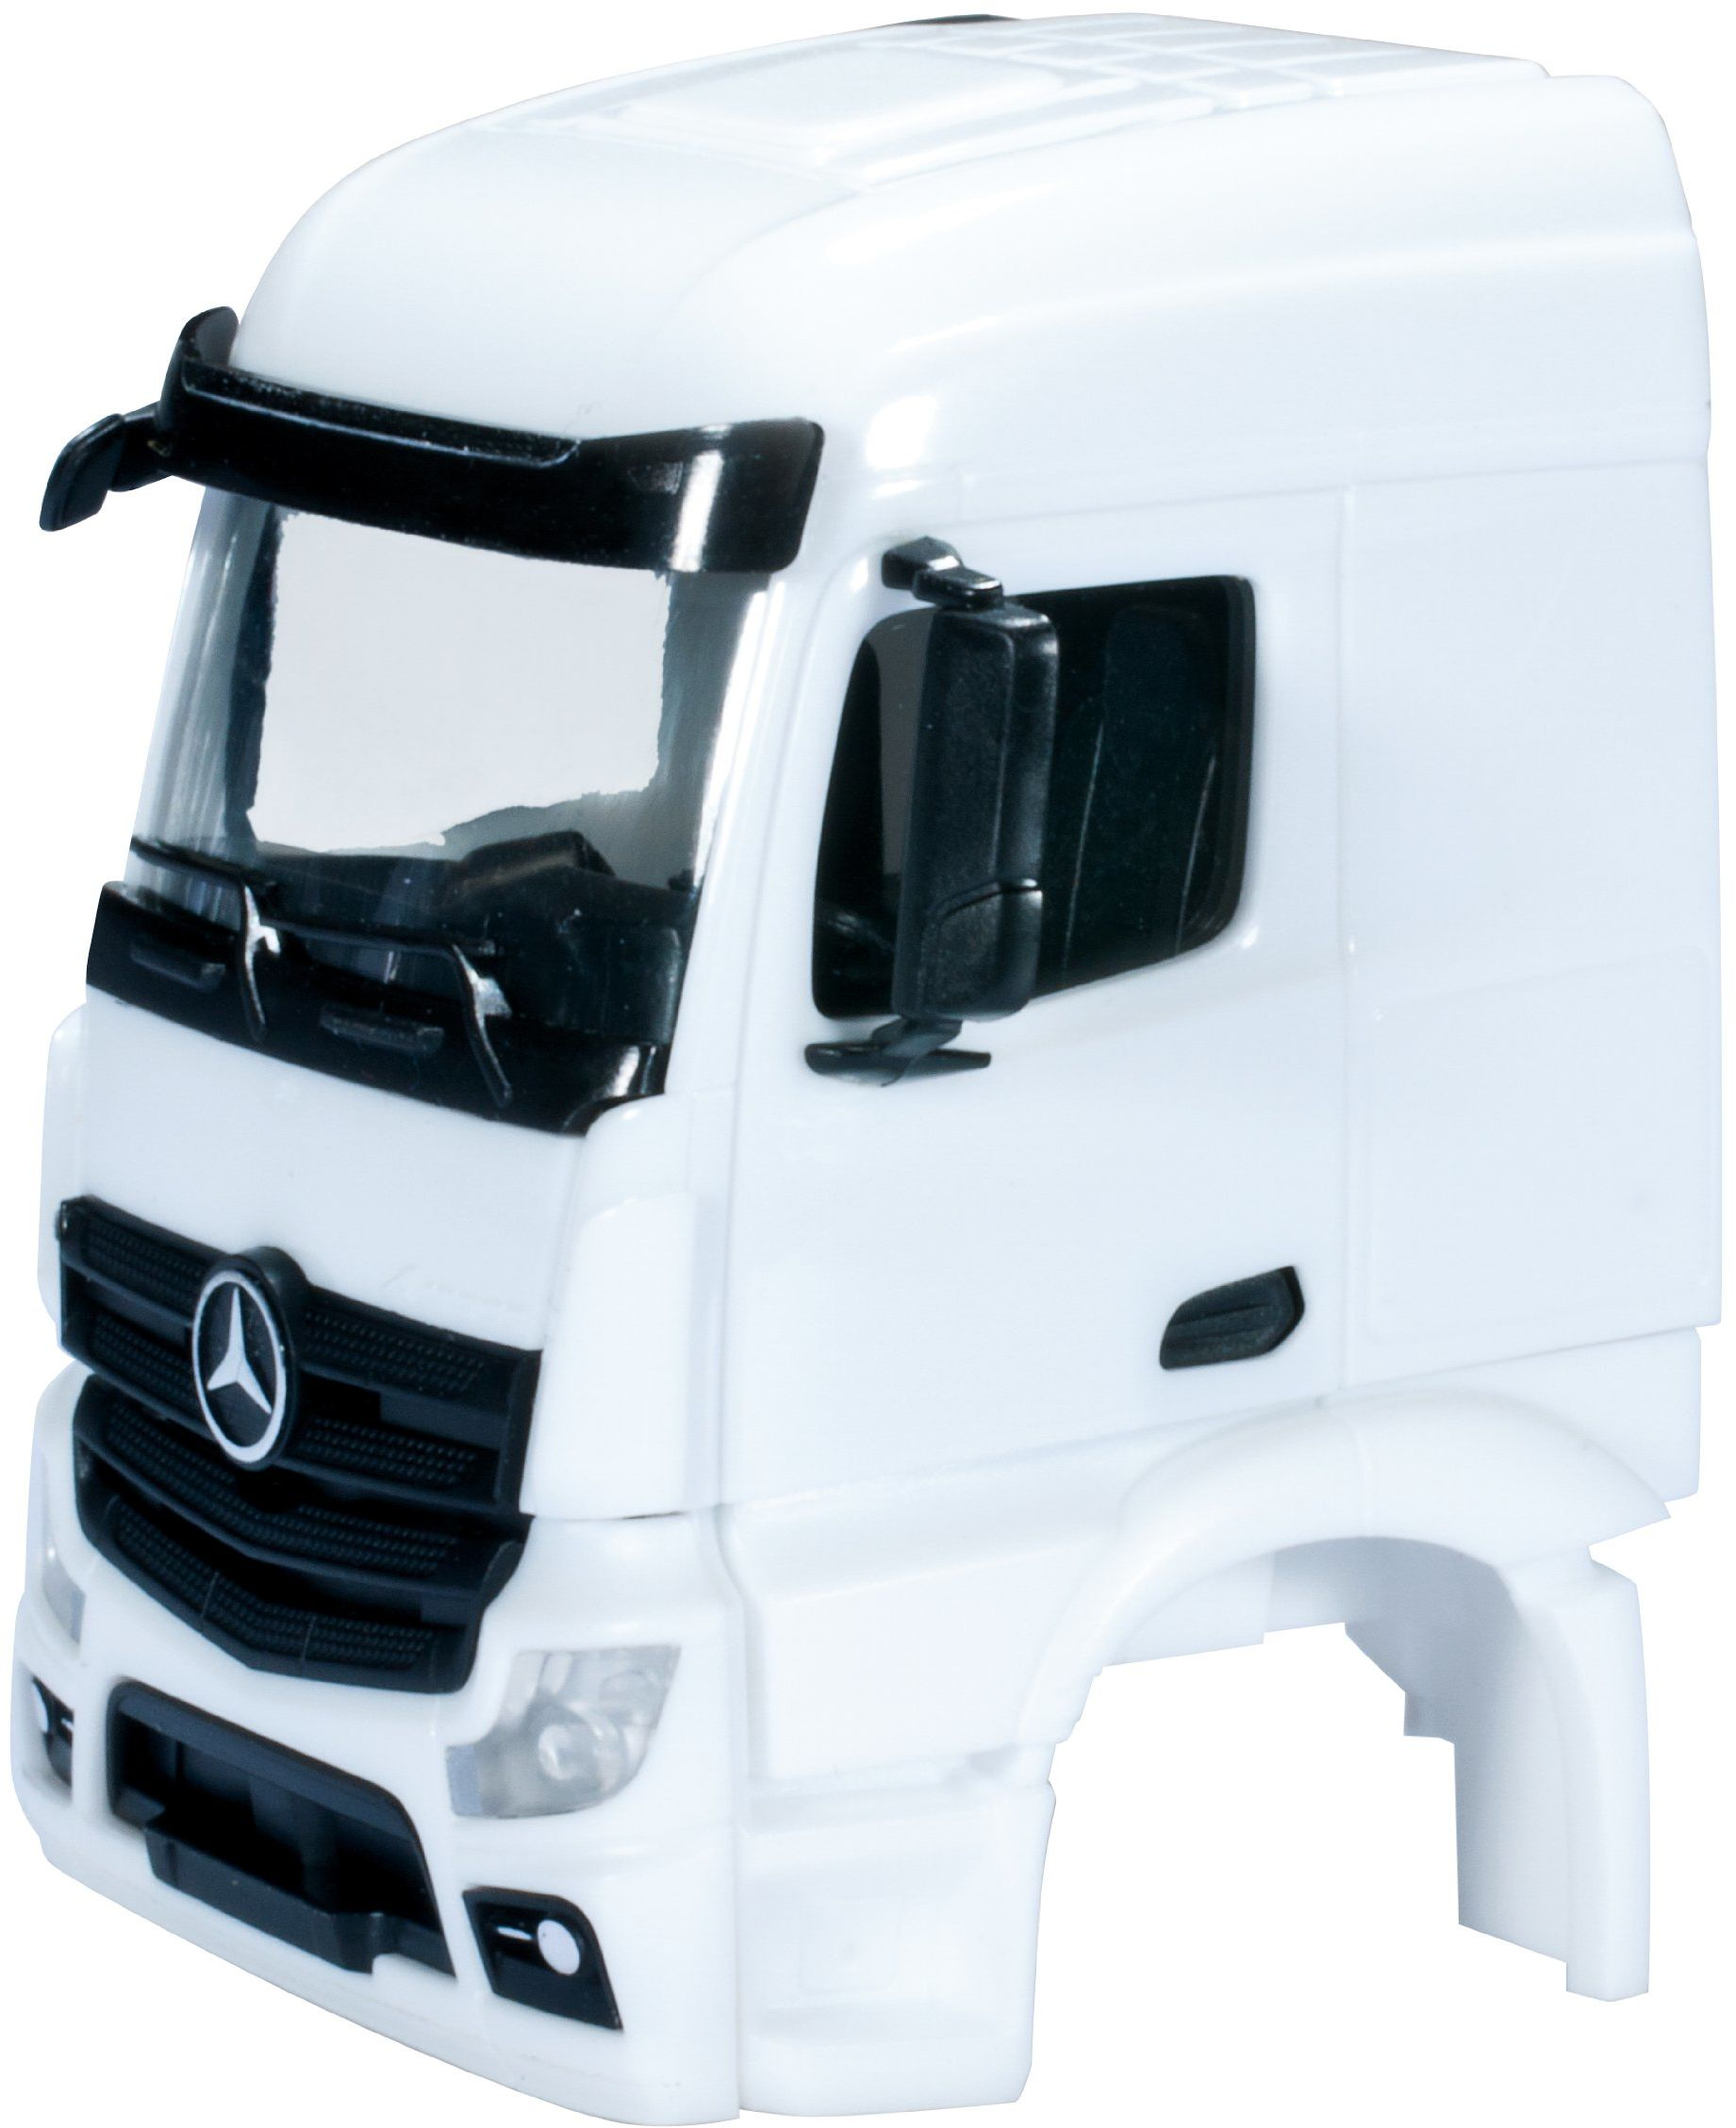 herpa 083690 083690-Mercedes-Benz A3s Streamspace 2,3 cab sep grill bez WLB, 2 szt